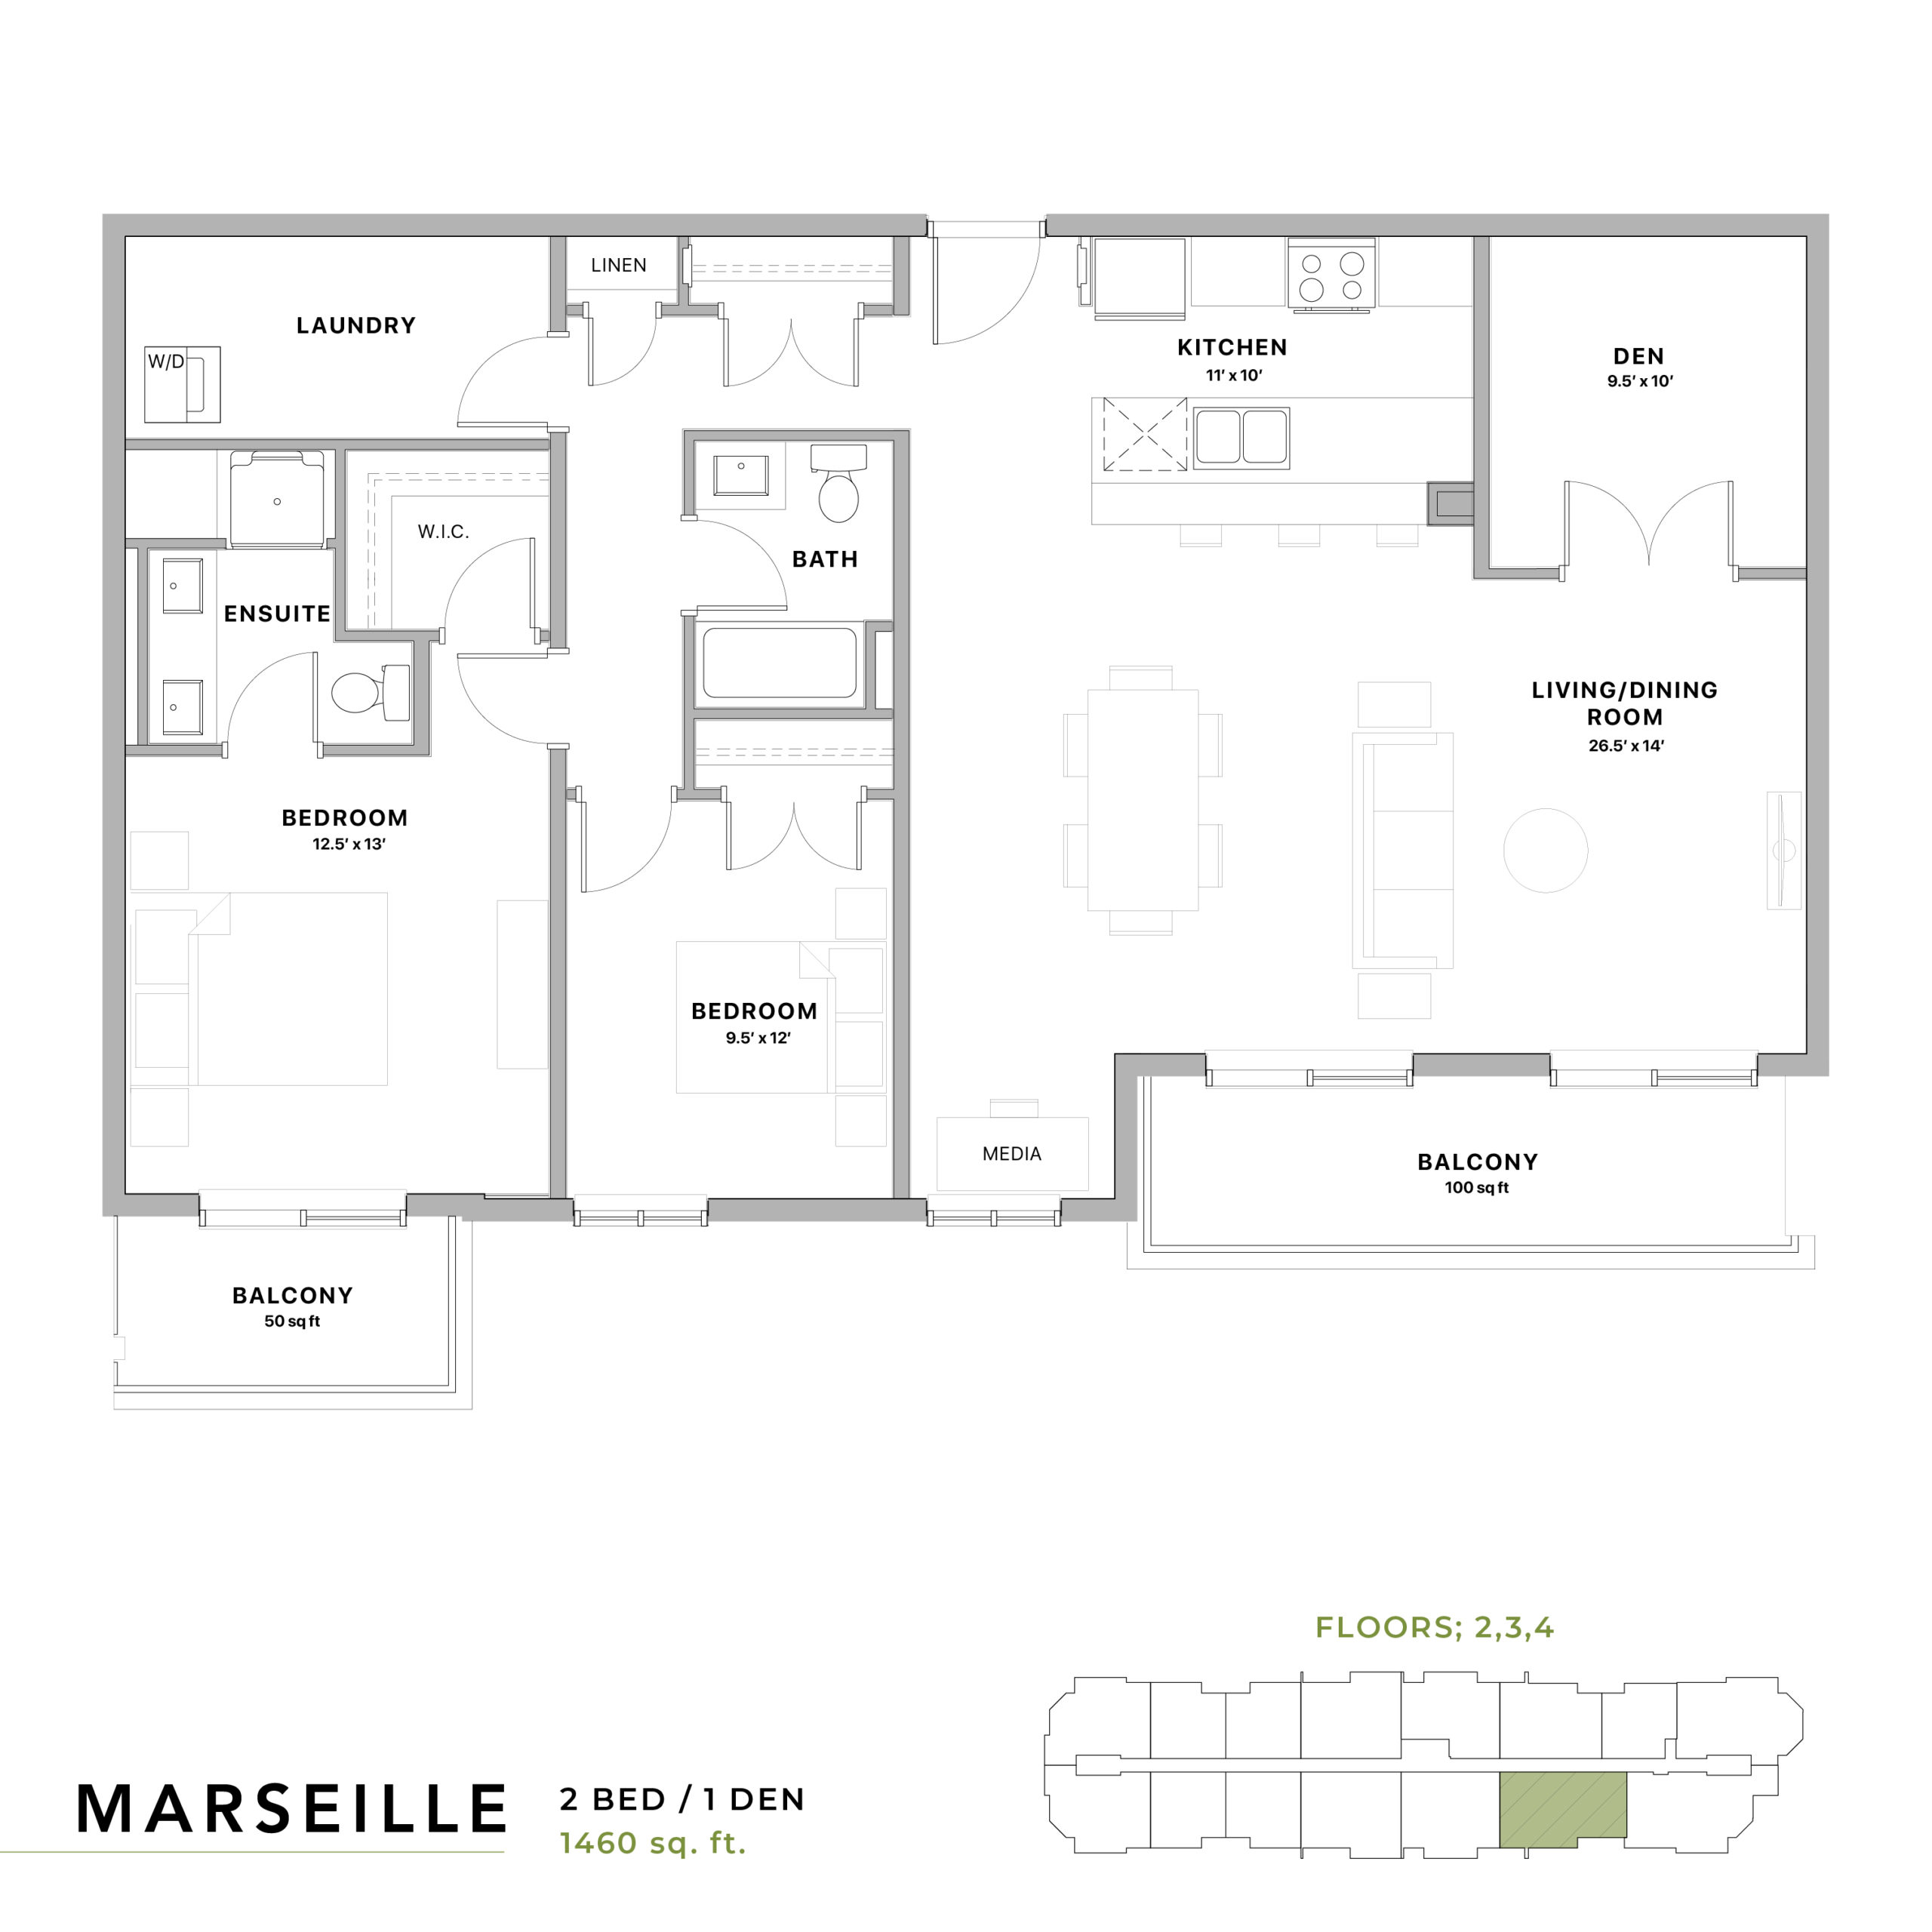 Marseille Floorplan